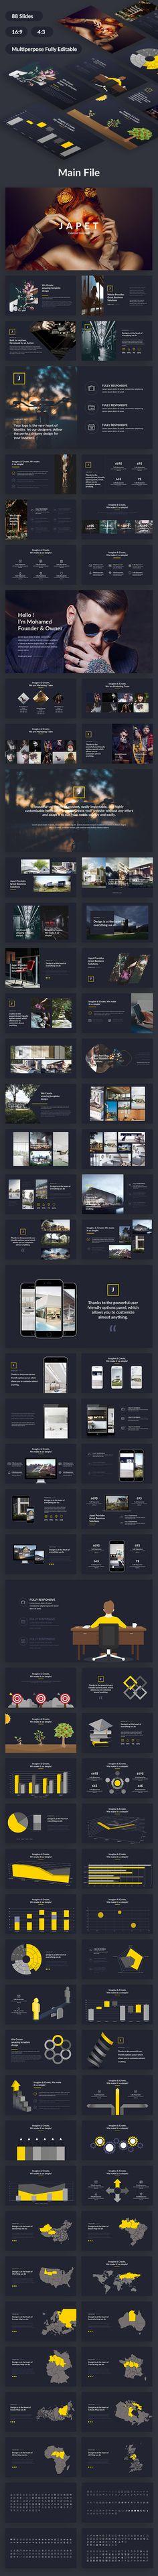 Japet Creative Design Google Slide Template